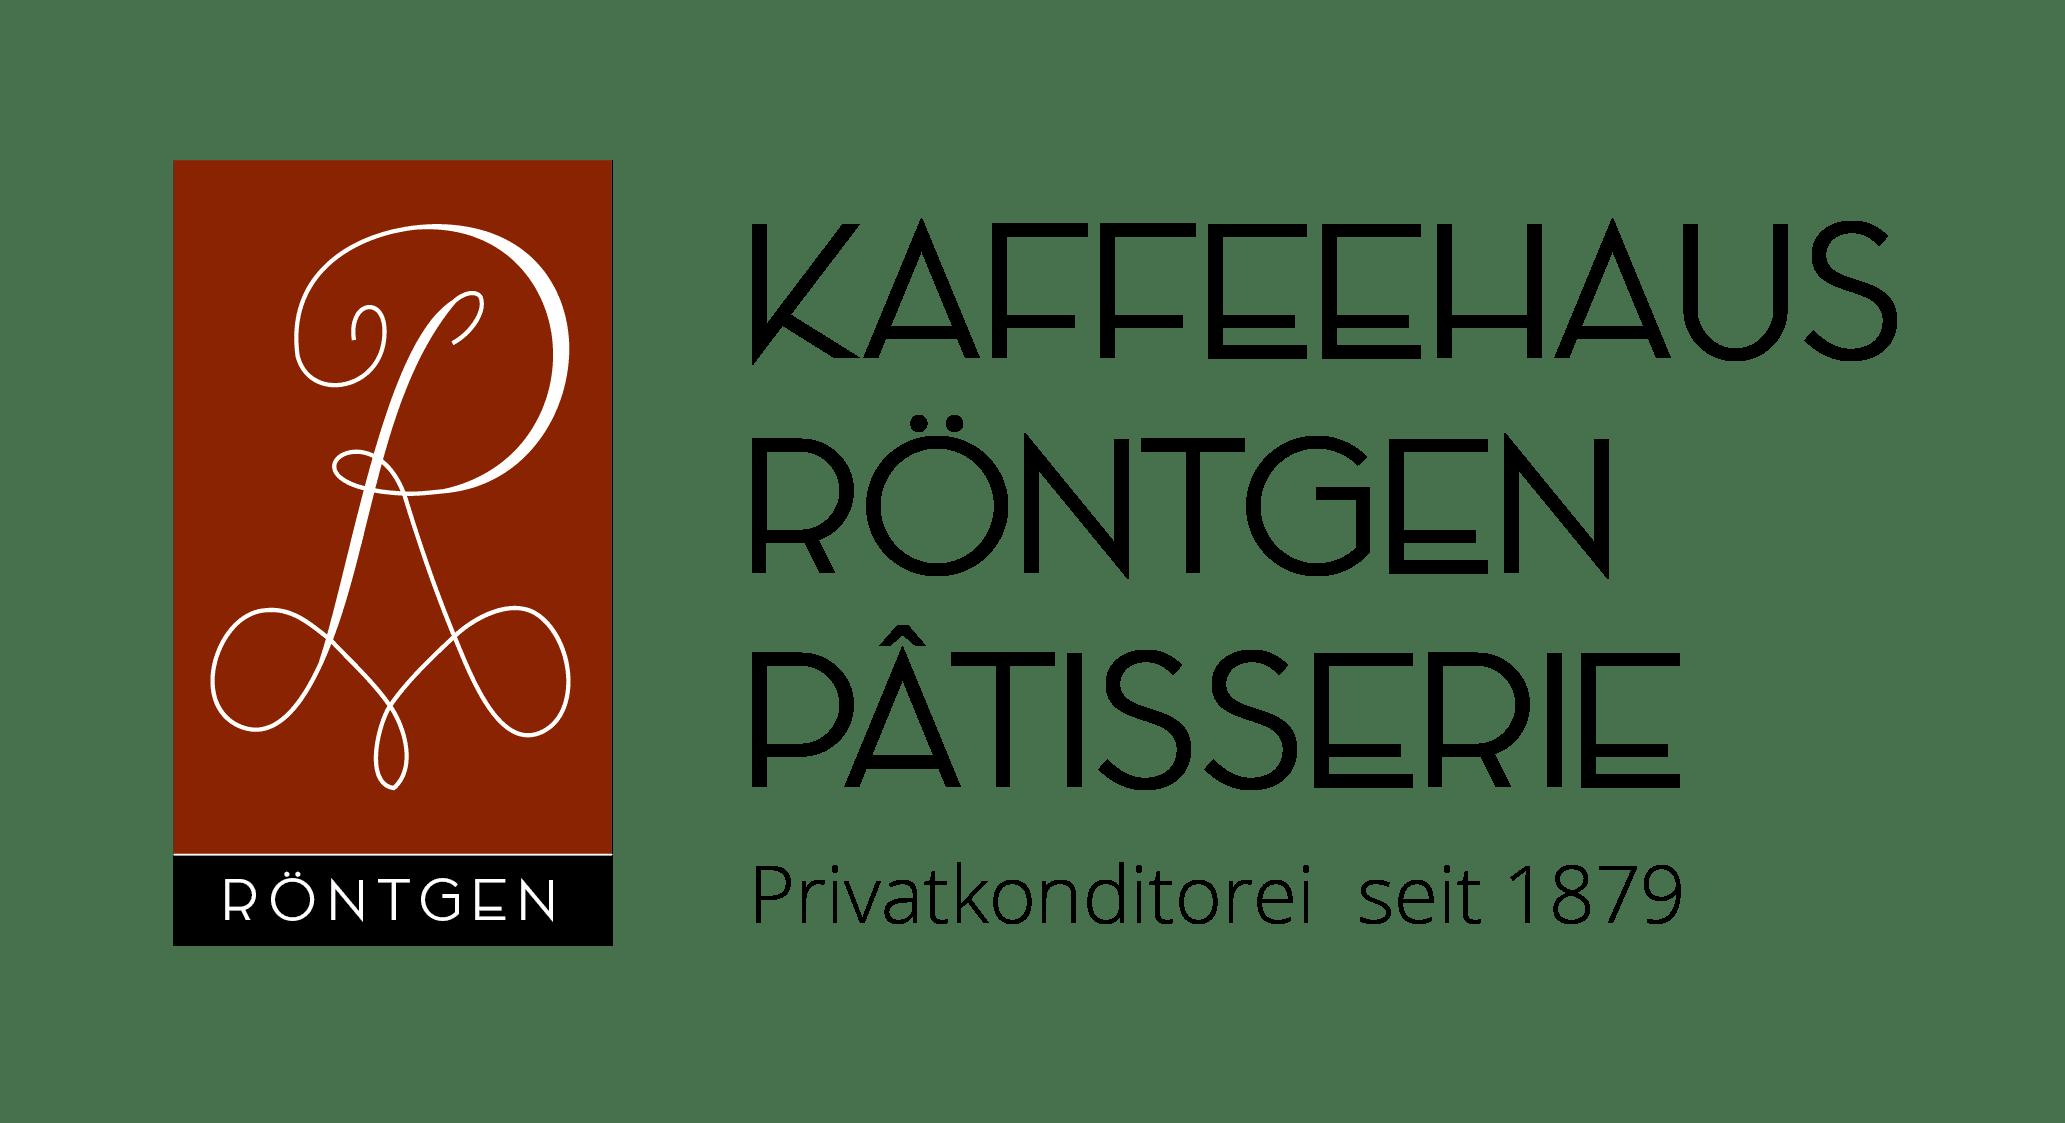 Kaffeehaus Röntgen Pâtisserie